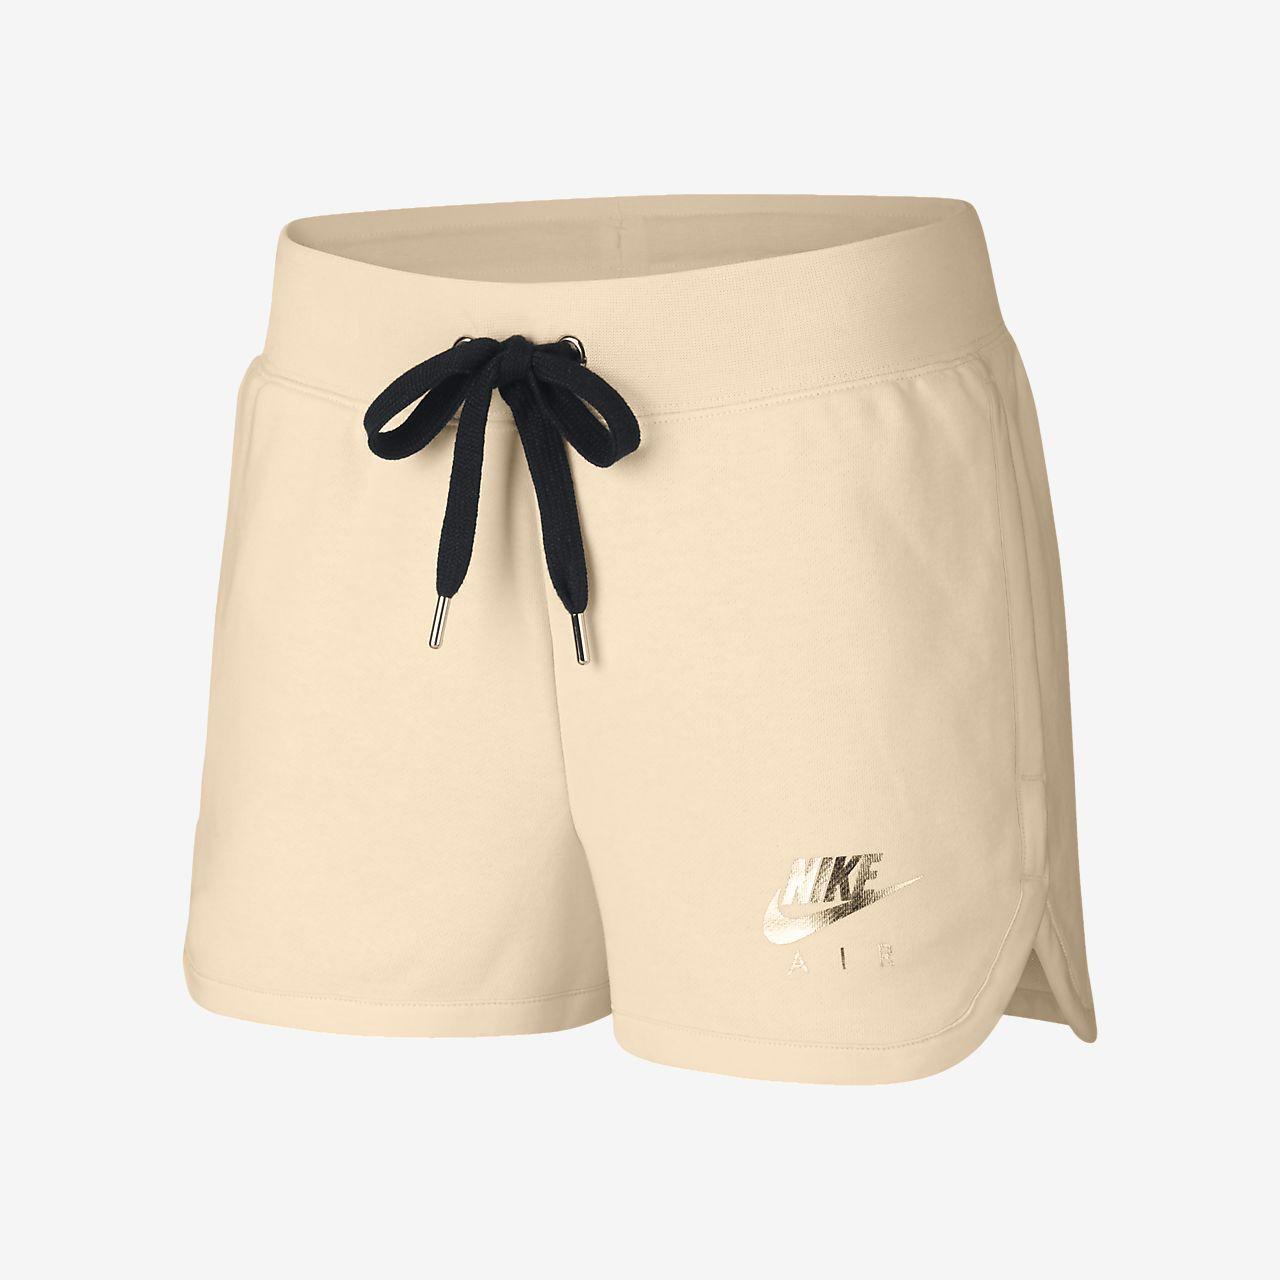 premium selection dea86 bcc24 Nike Air Fleece-Shorts für Damen